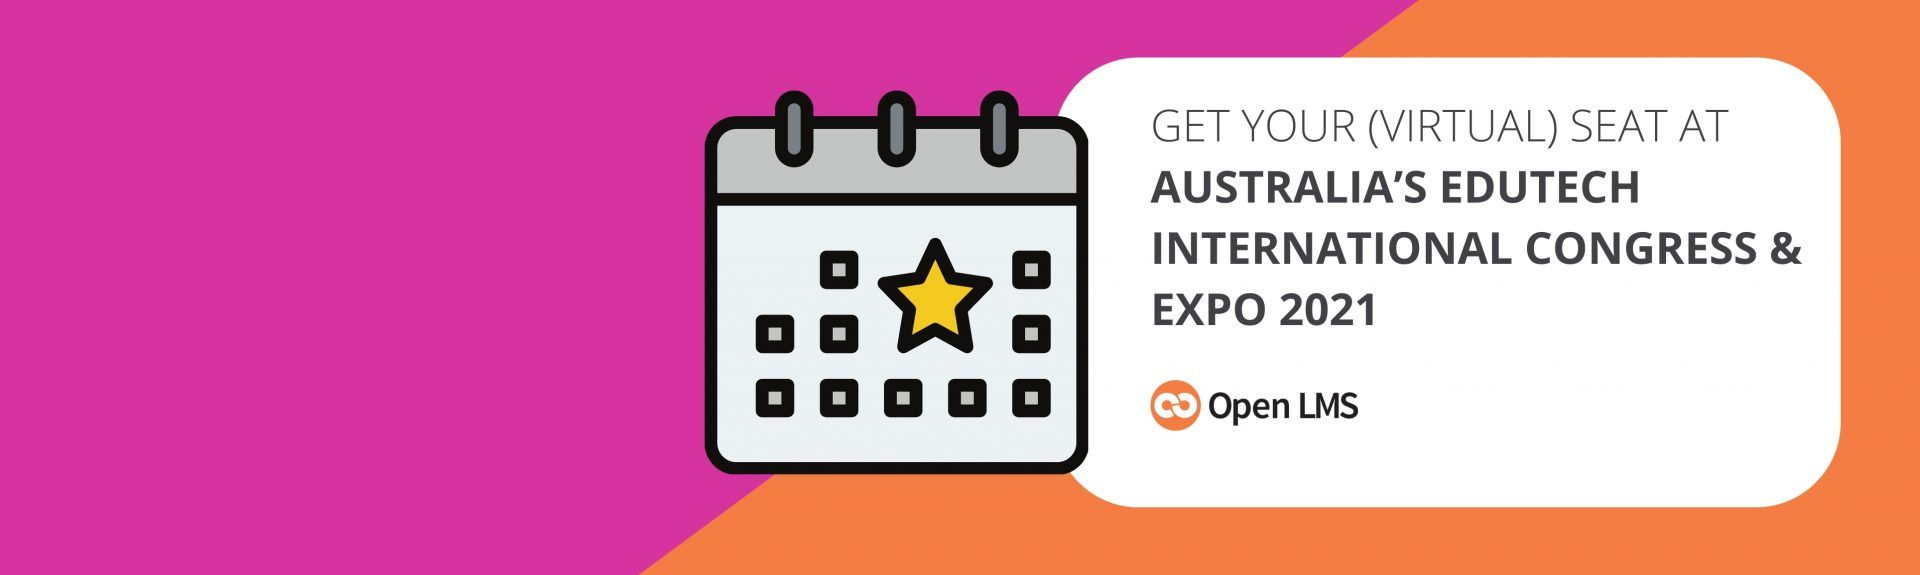 Get Your (Virtual) Seat at Australia's EduTECH International Congress & Expo 2021